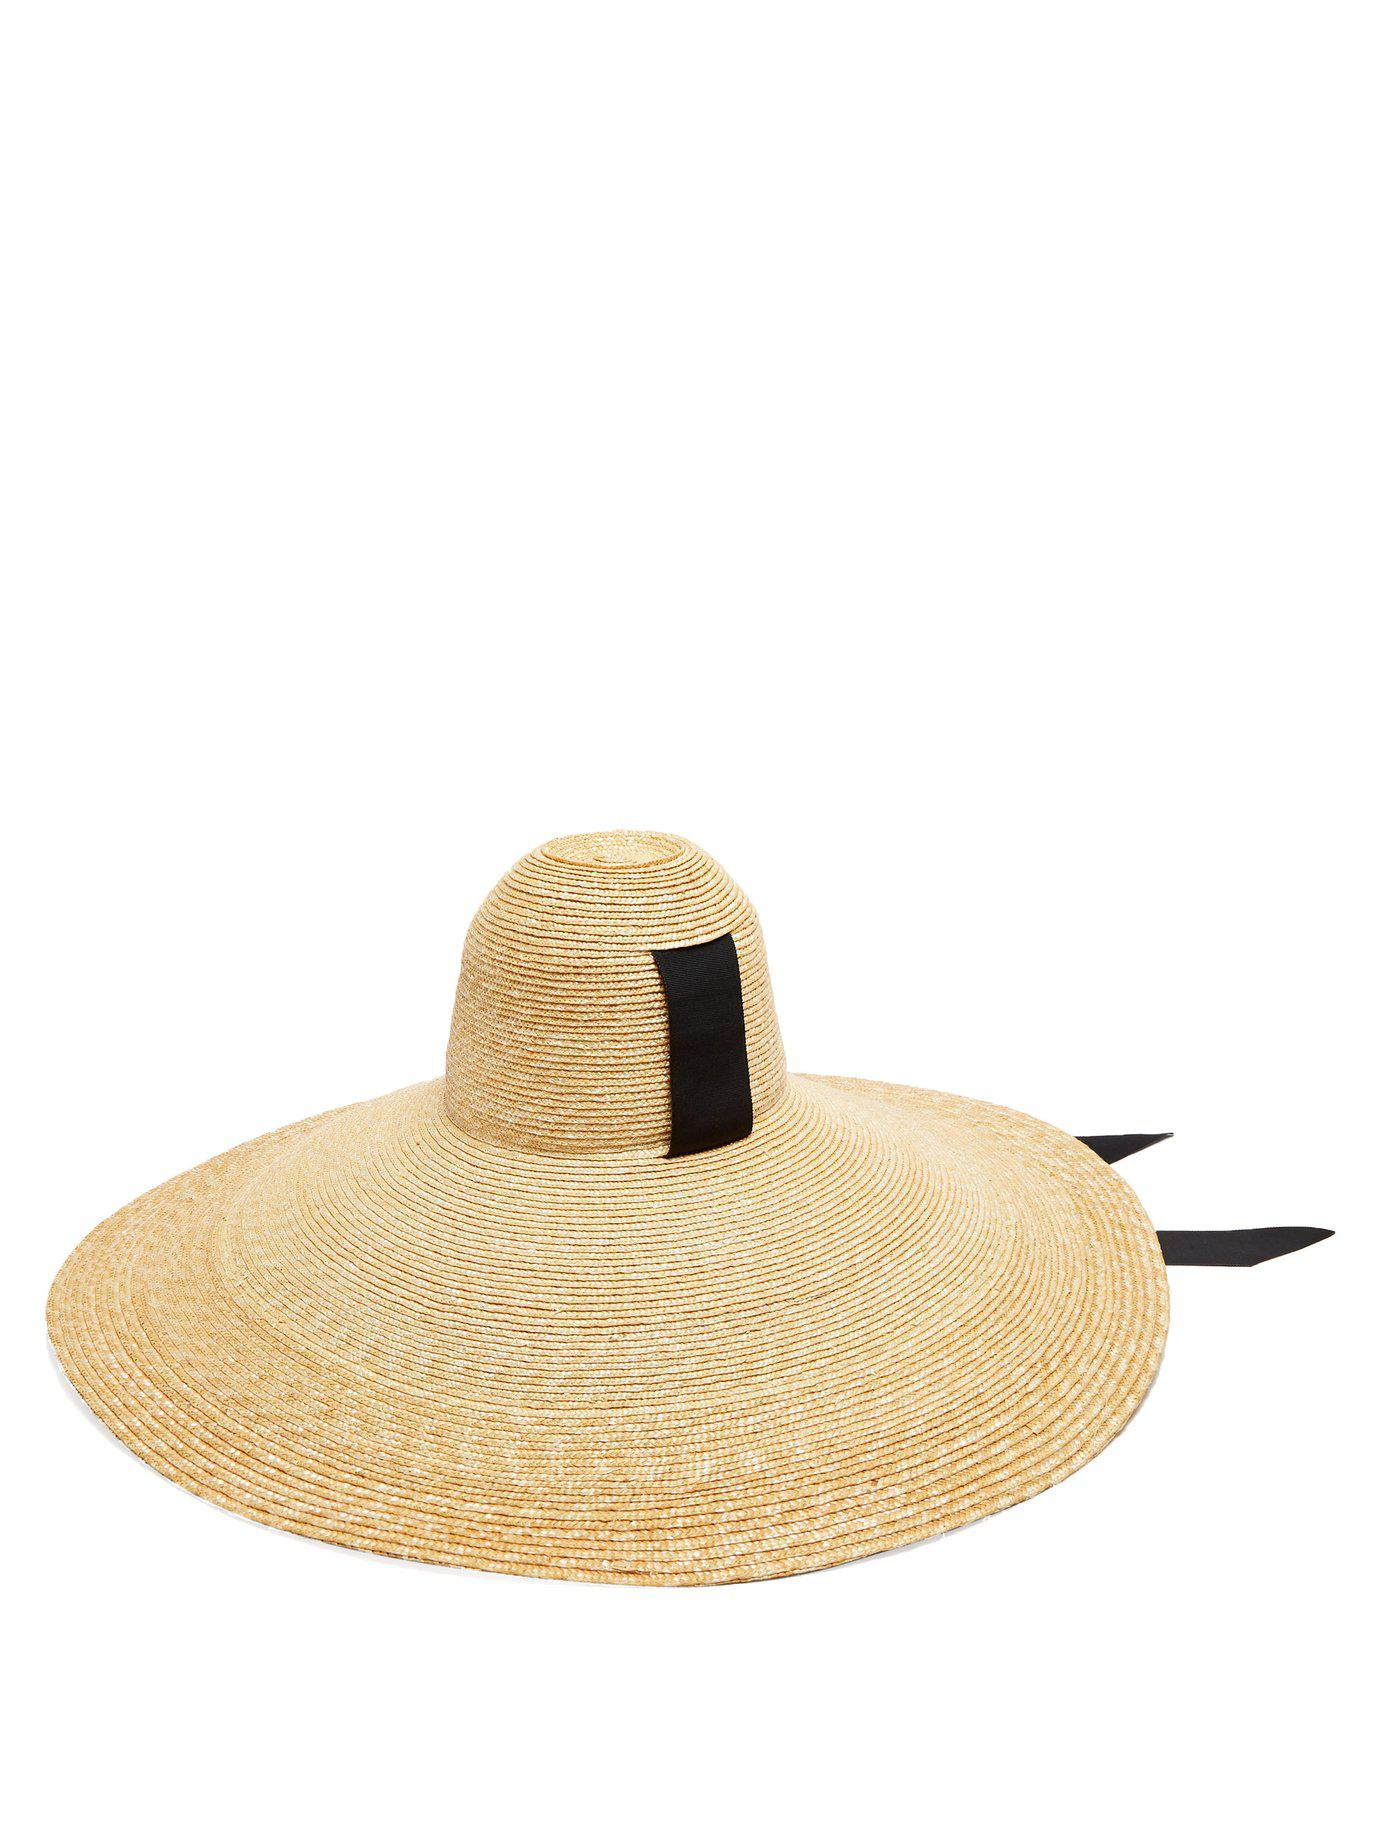 363e76cf5d978 Lola Hats Sugar Cone Wide Brim Straw Hat in Black - Lyst